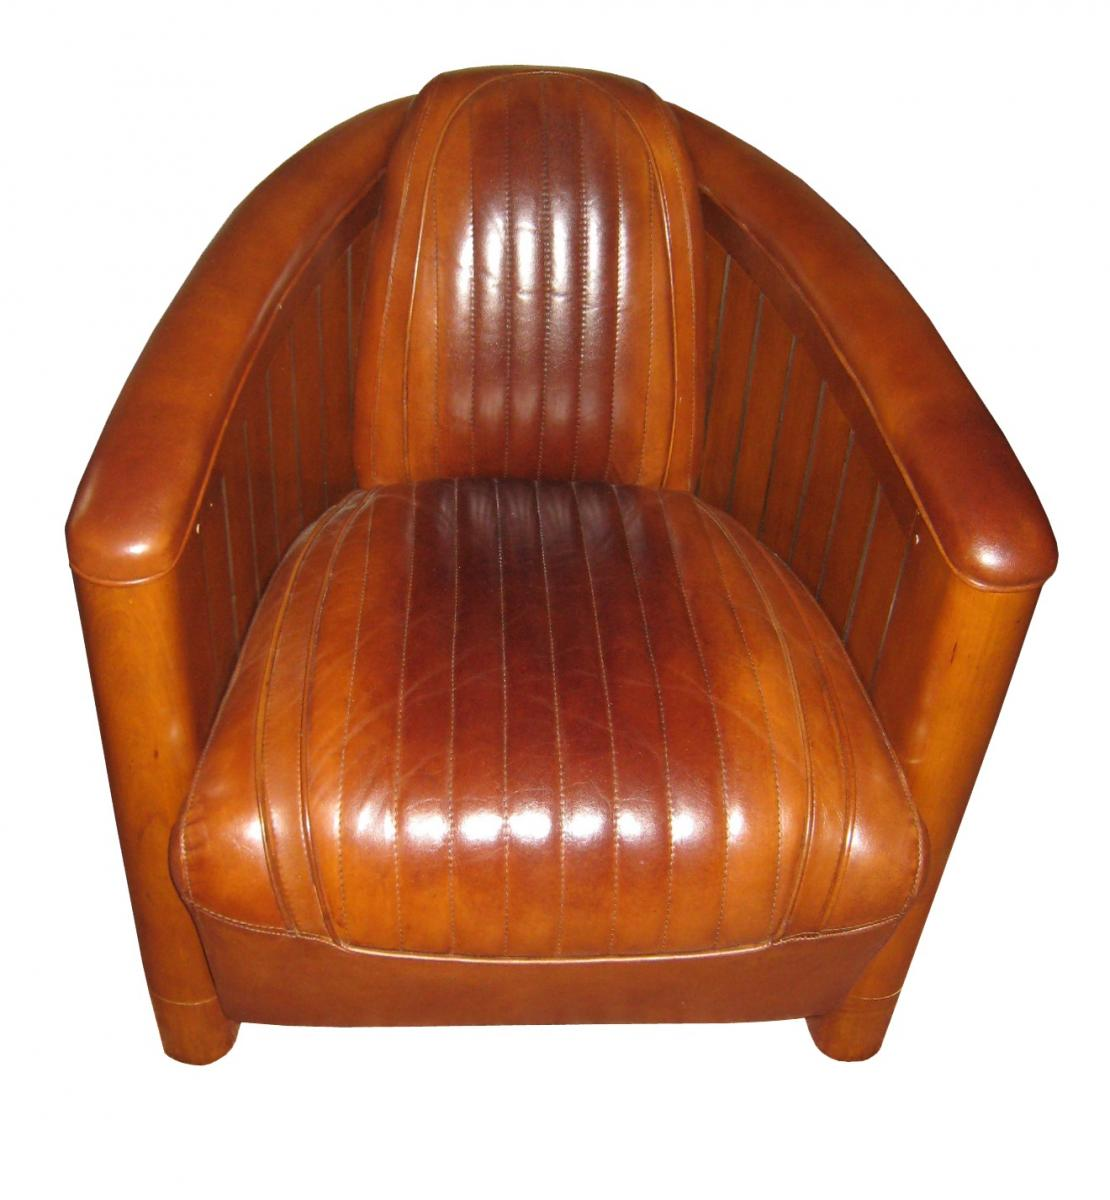 art deco ledersessel leder clubsessel nautic hell braun rund. Black Bedroom Furniture Sets. Home Design Ideas